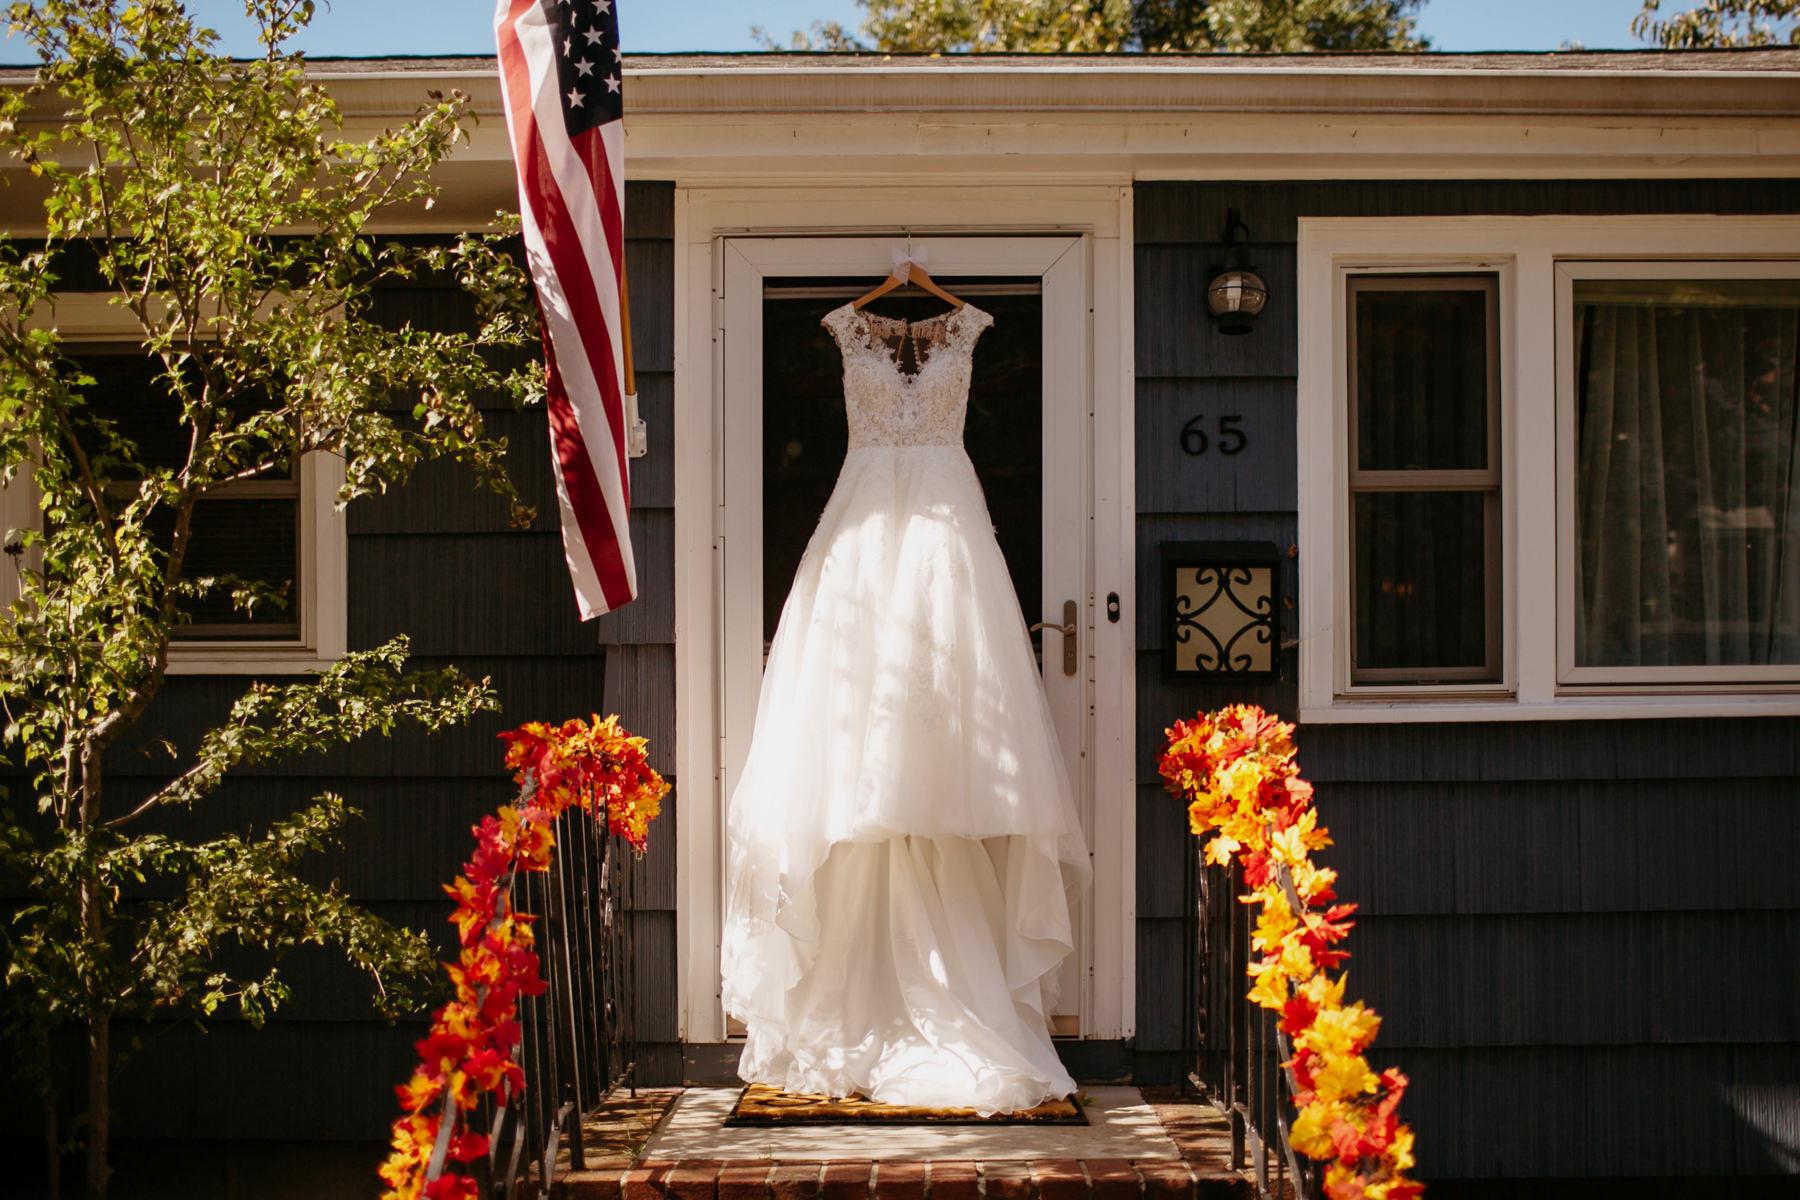 Quincy Ma Massachusetts Wedding Dedham Boston Granie Links Wedding New England Catholic Cathedral Liz Osban Photography 1.jpg